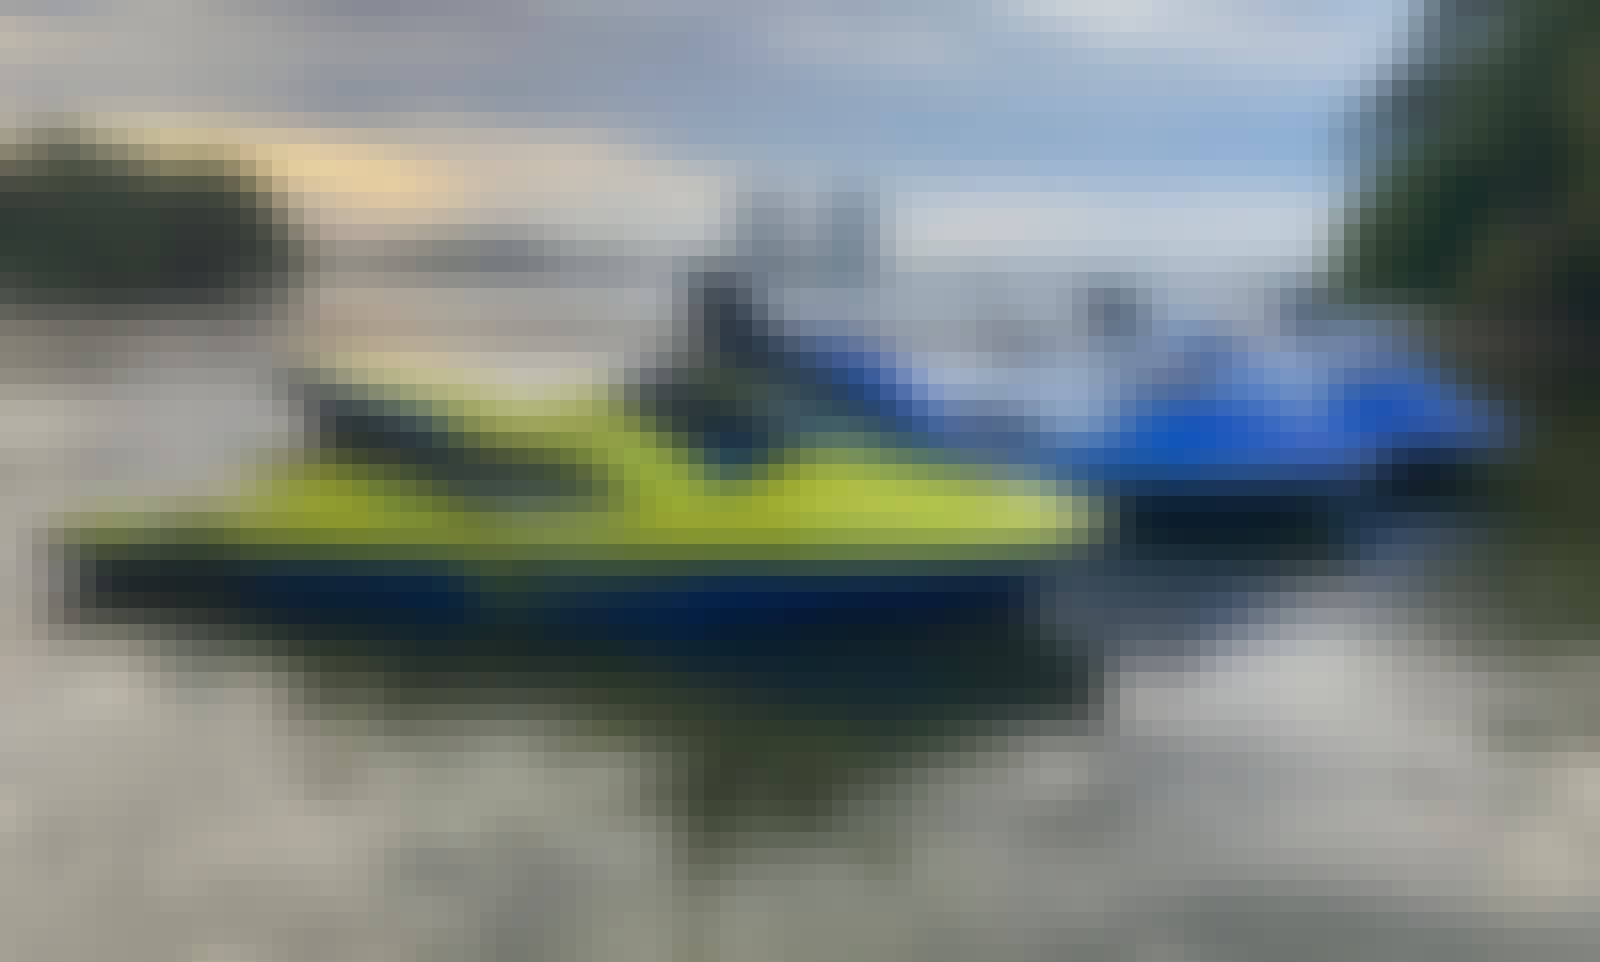 2020 Yamaha EX Deluxe Jetski Rentals in Haulover Park, Florida